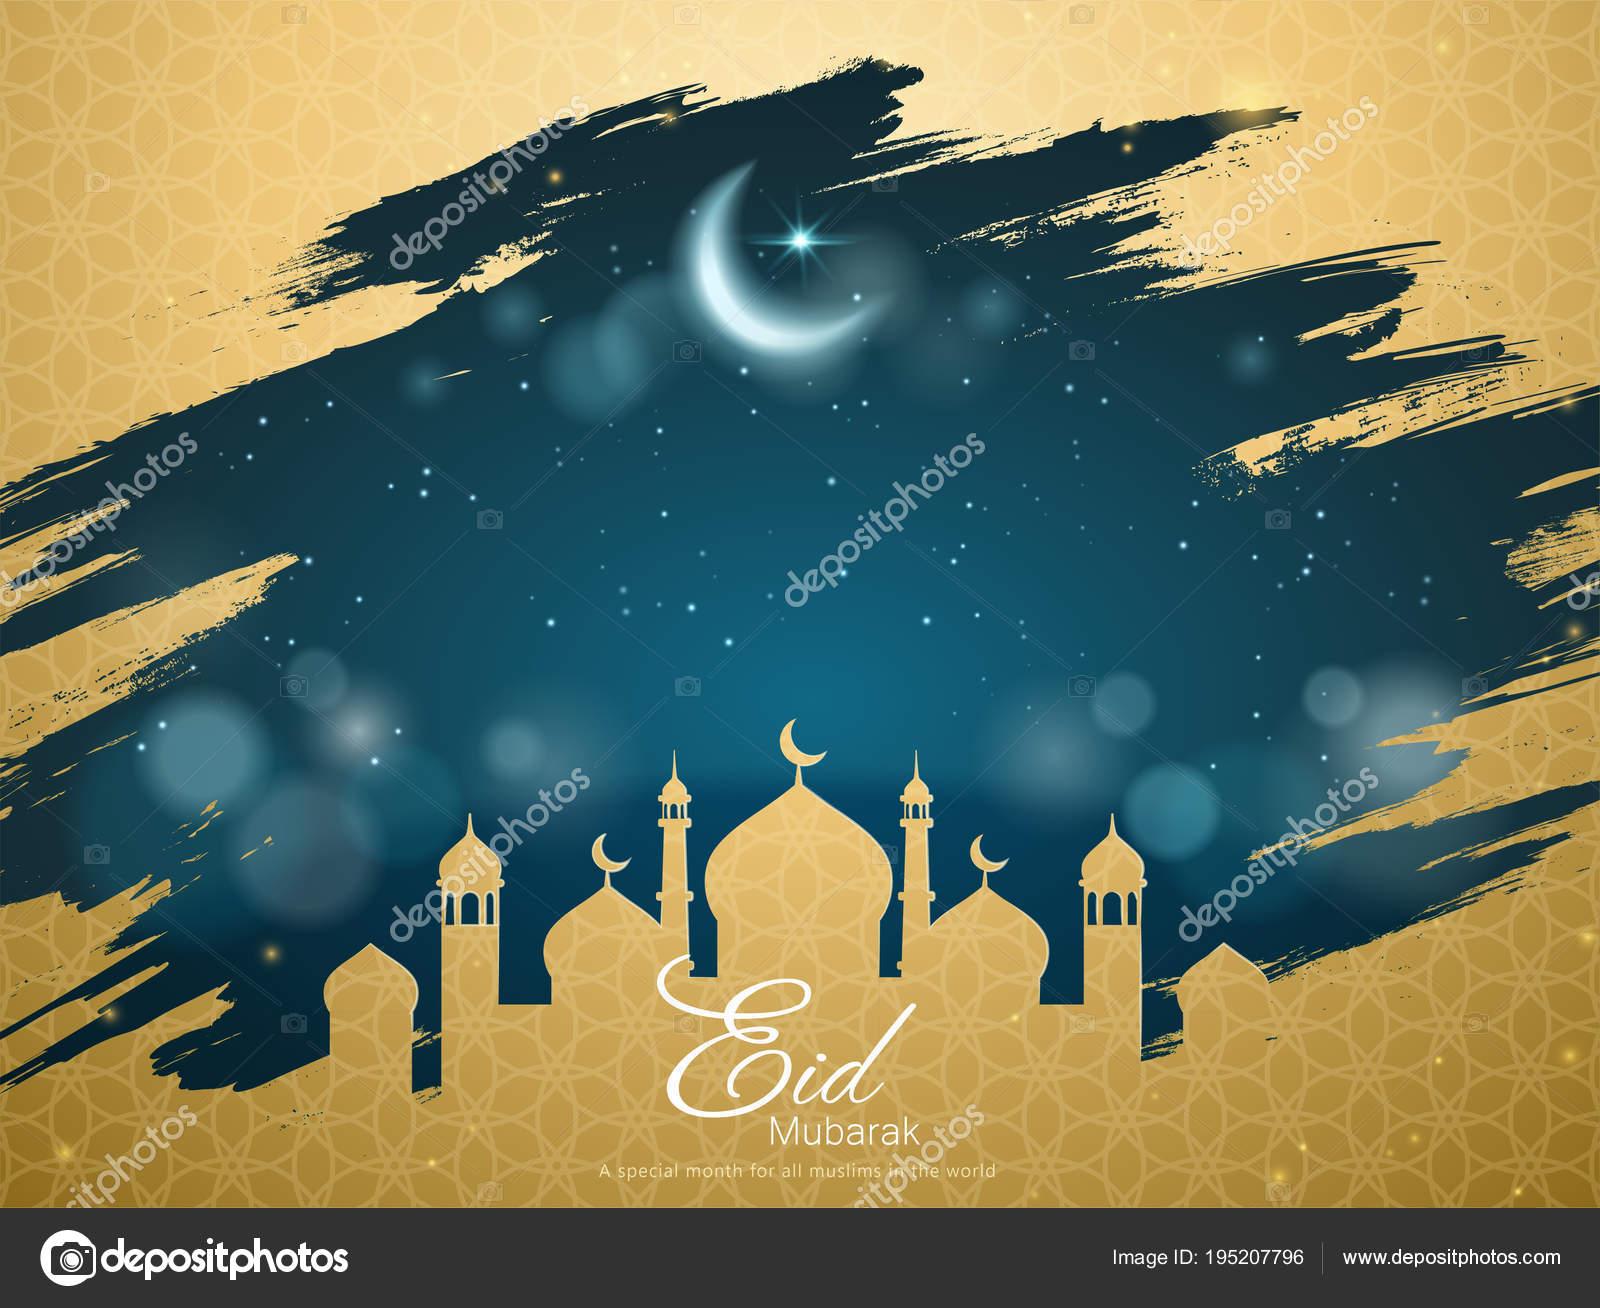 Eid Mubarak Greeting Card Vector Image By C Kchungtw Vector Stock 195207796